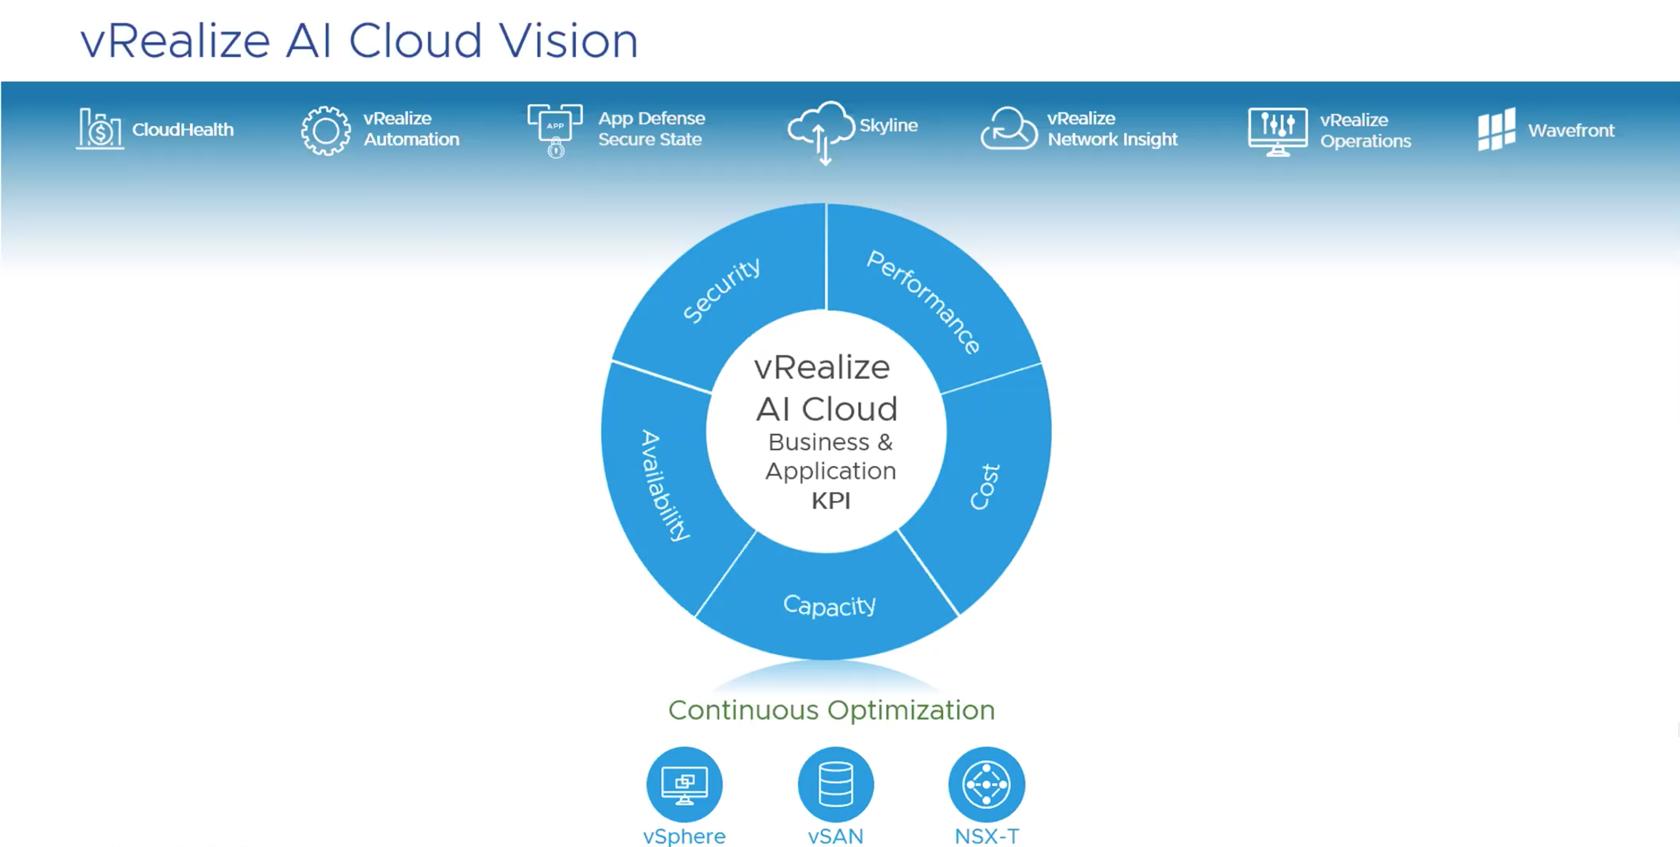 vRealize AI Cloud